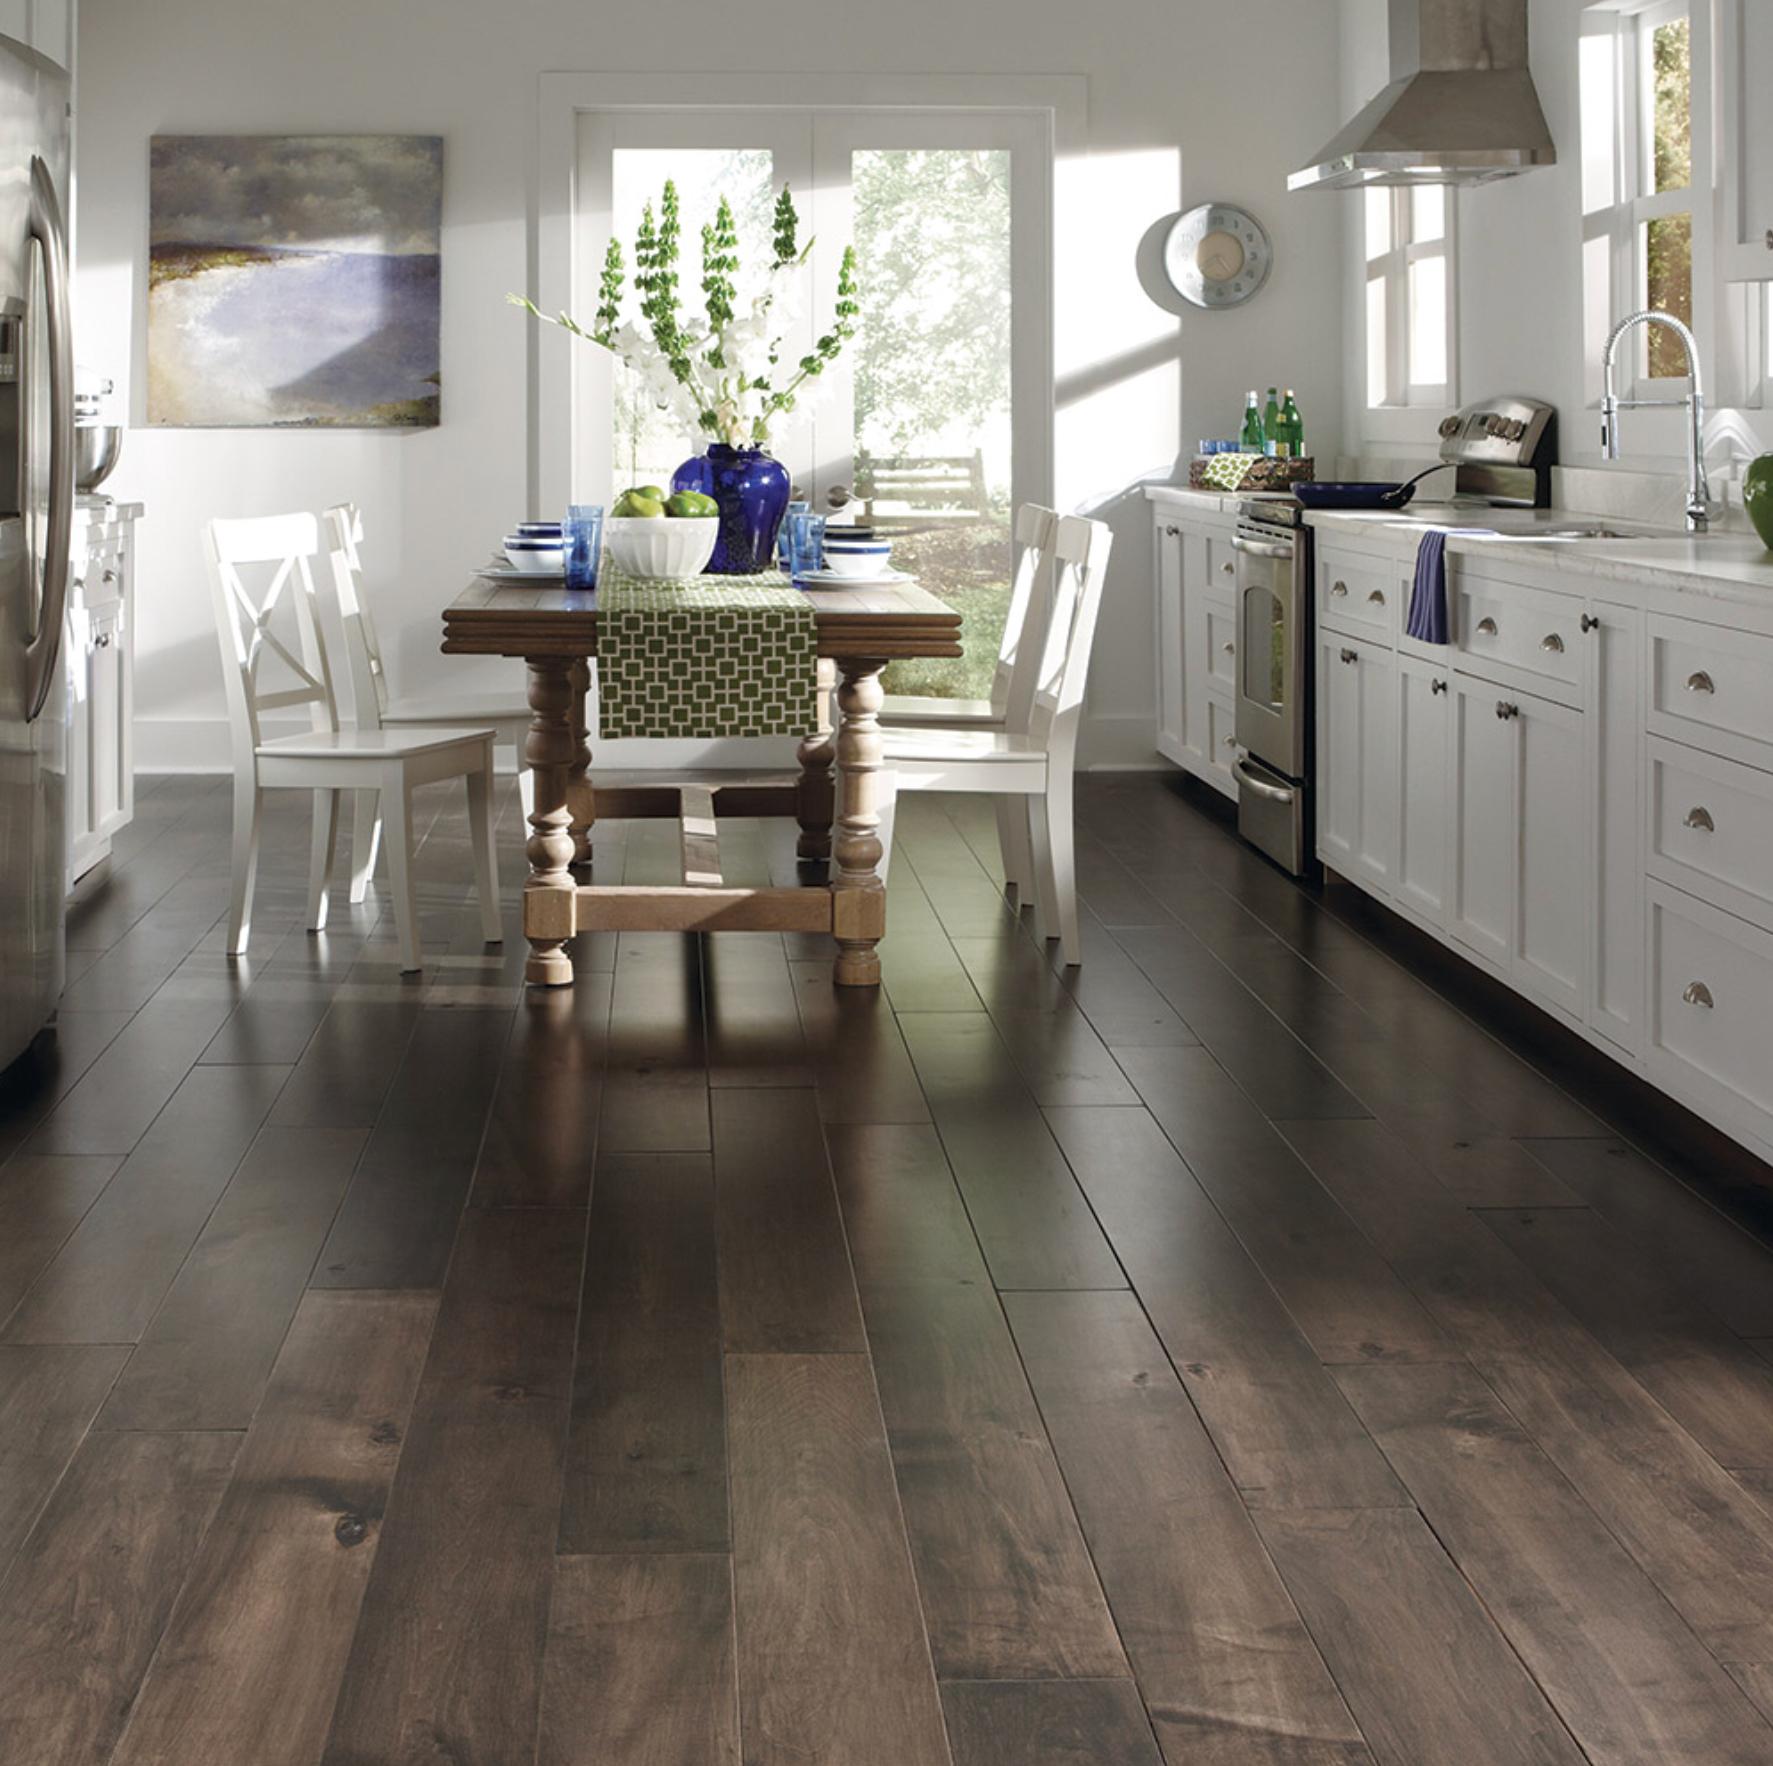 homewise-innovations-wood-flooring-2